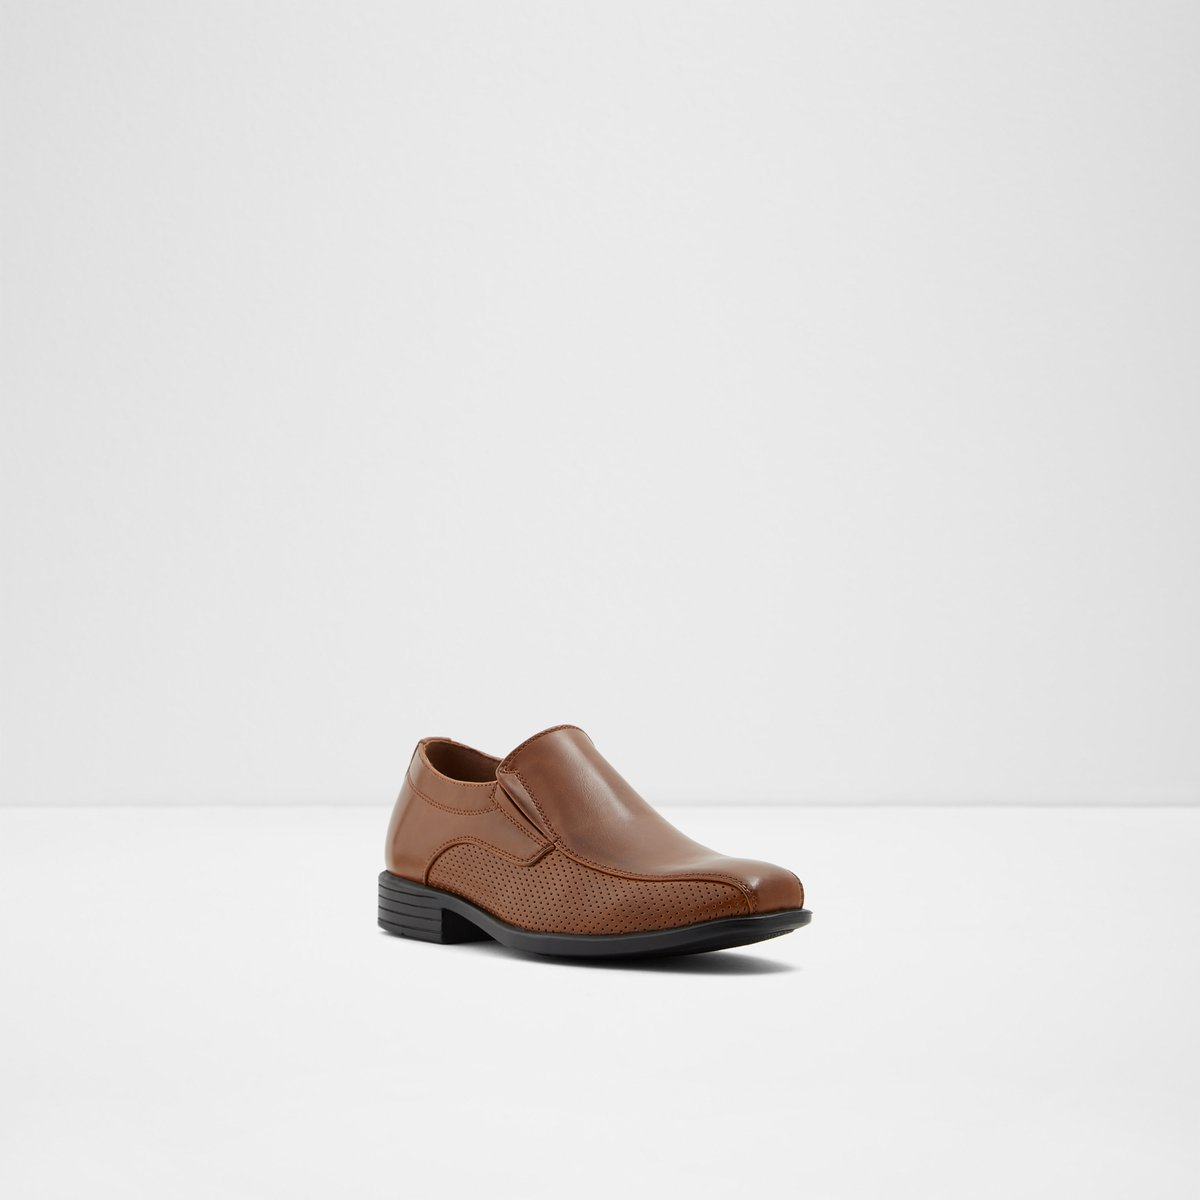 Cognac Drayniel K Women's ShoesUs USzqMLVpG